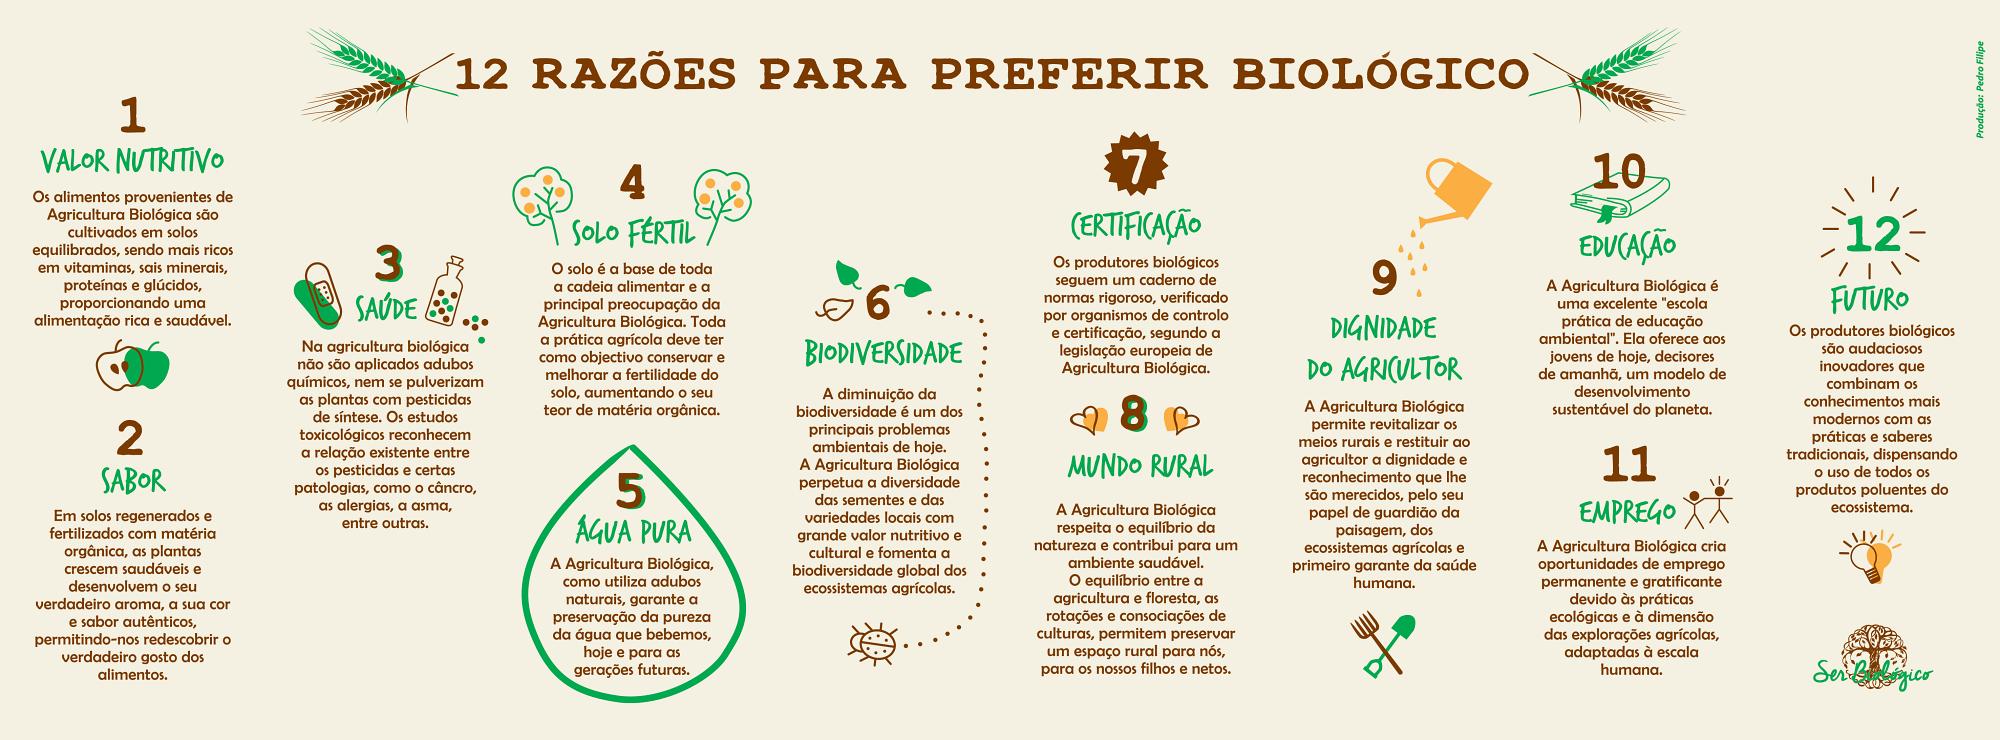 Biológico